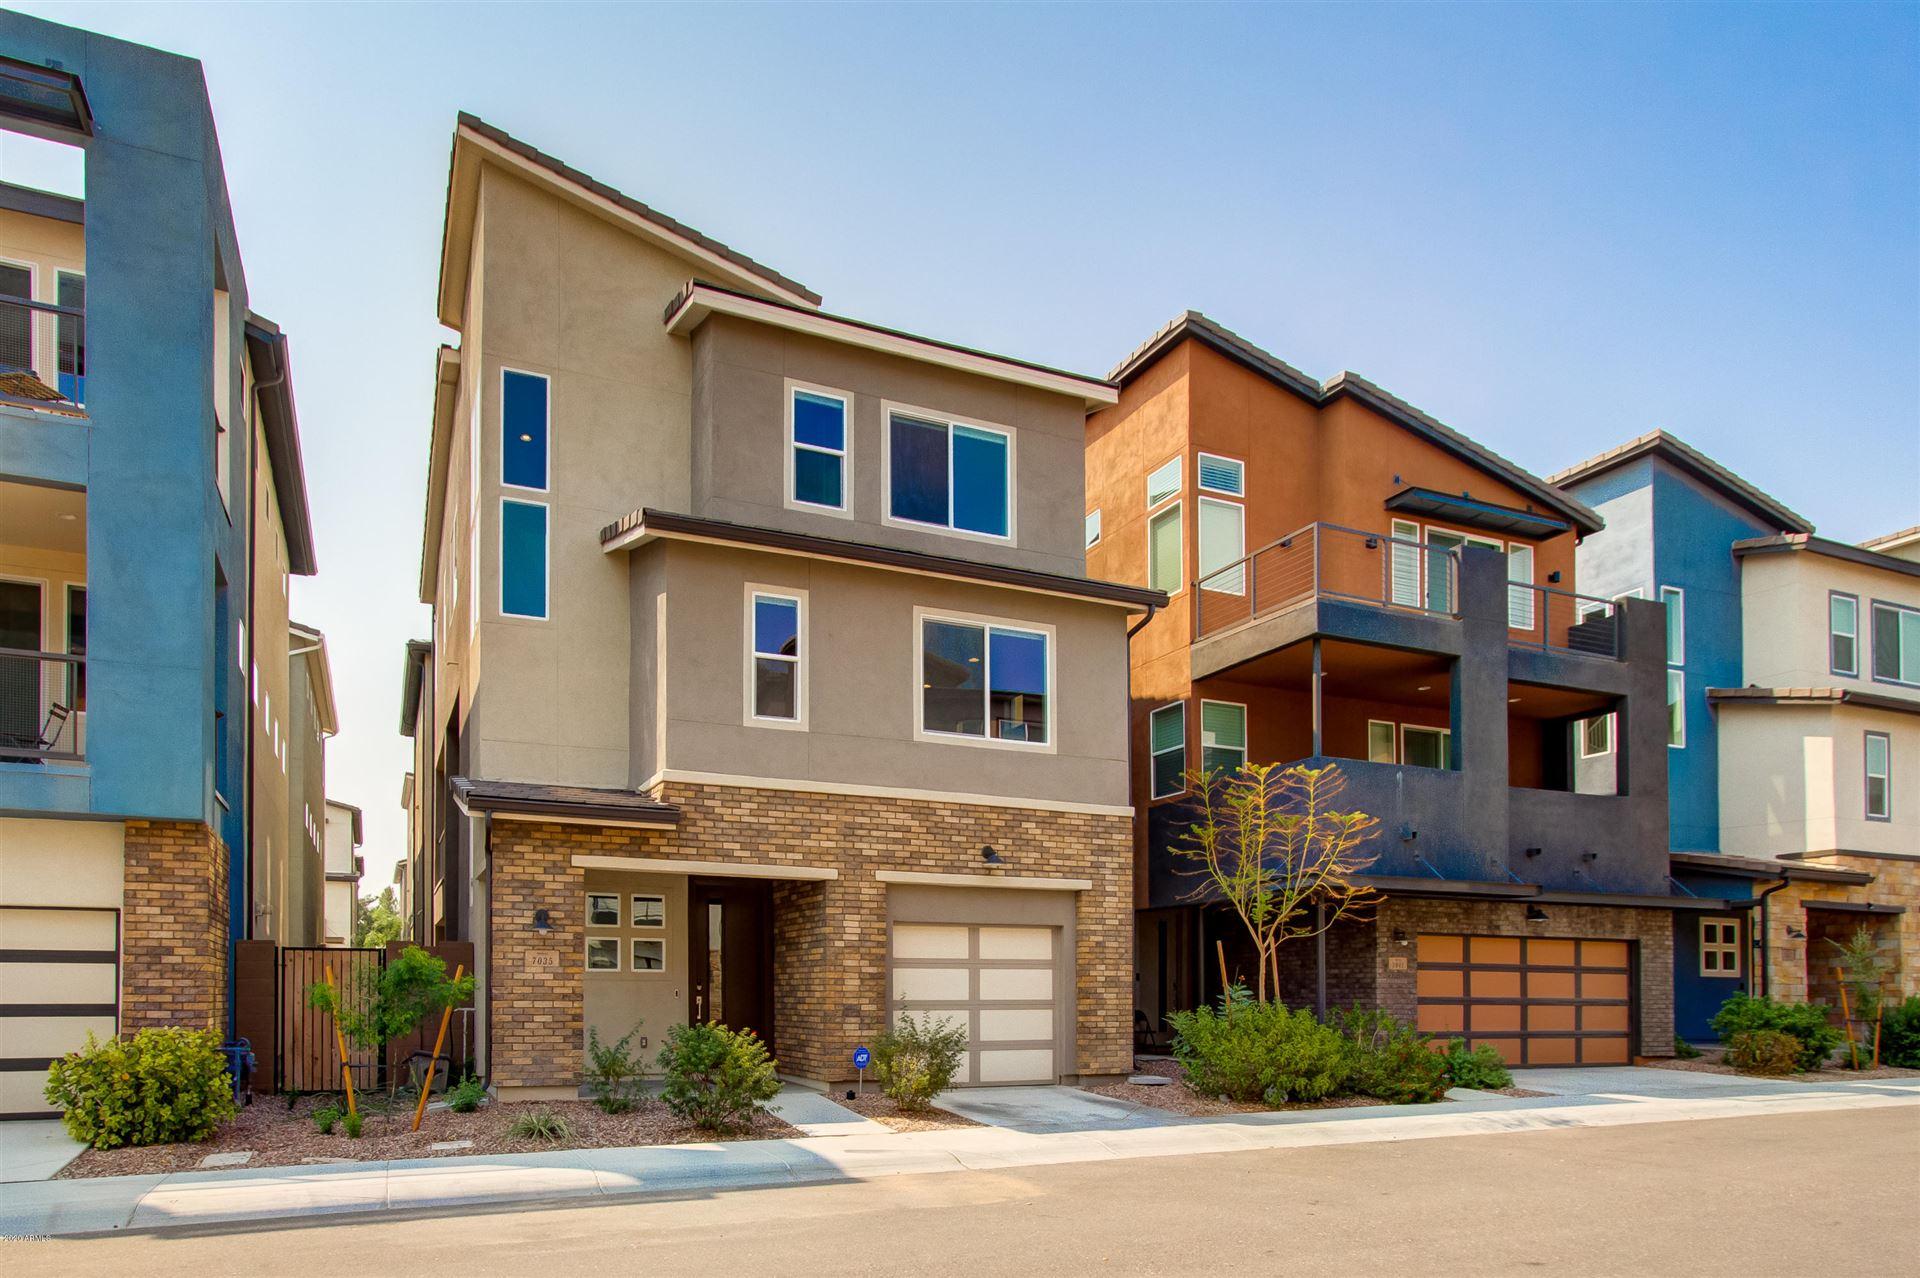 7035 W Stardust Drive, Chandler, AZ 85226 - MLS#: 6123762